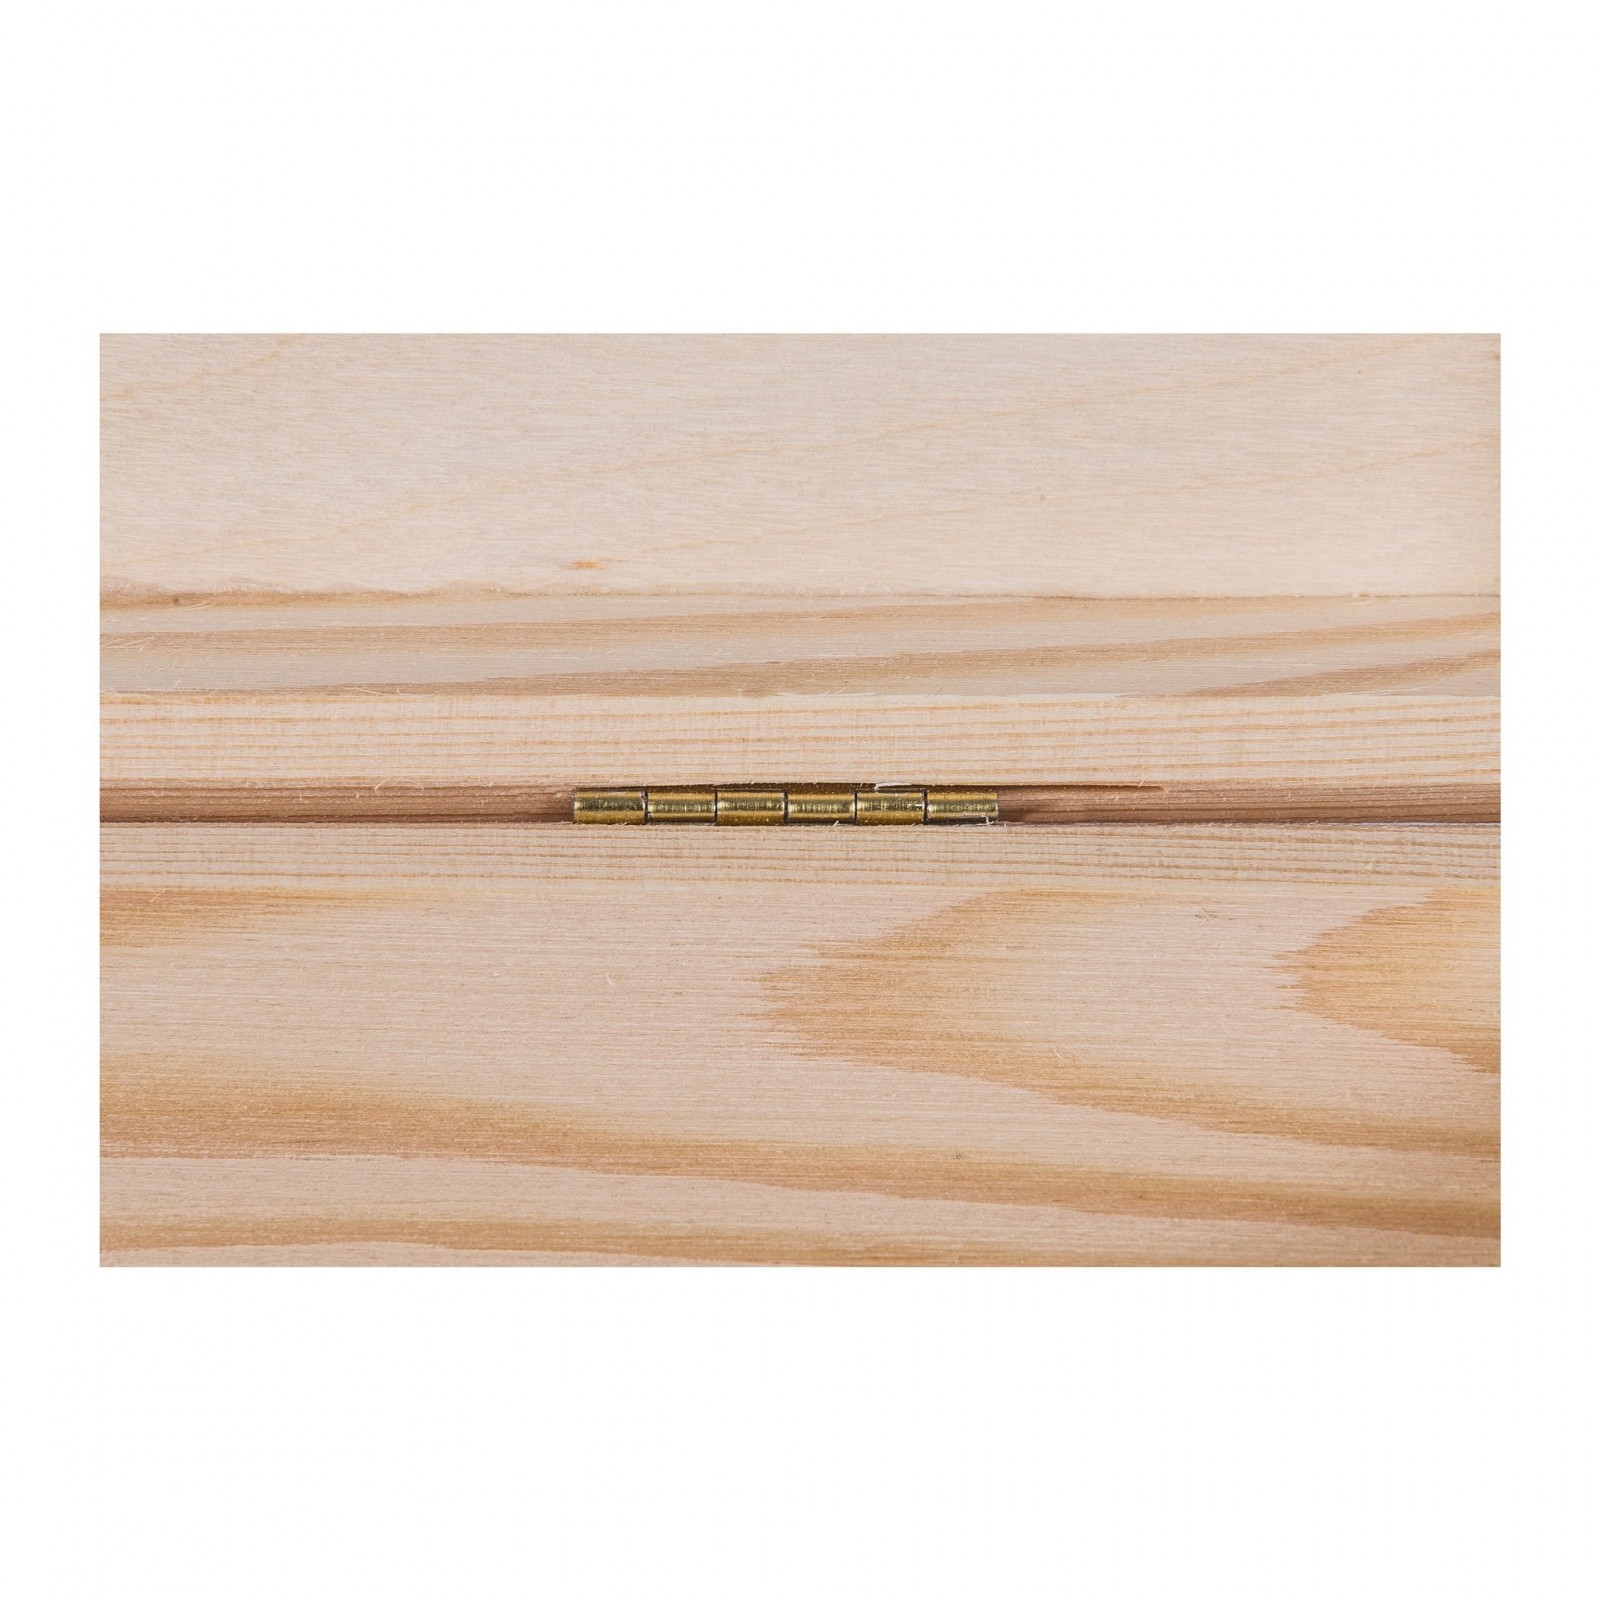 Drevená krabička so 4 priehradkami 9x28x8cm borovica megamix.sk